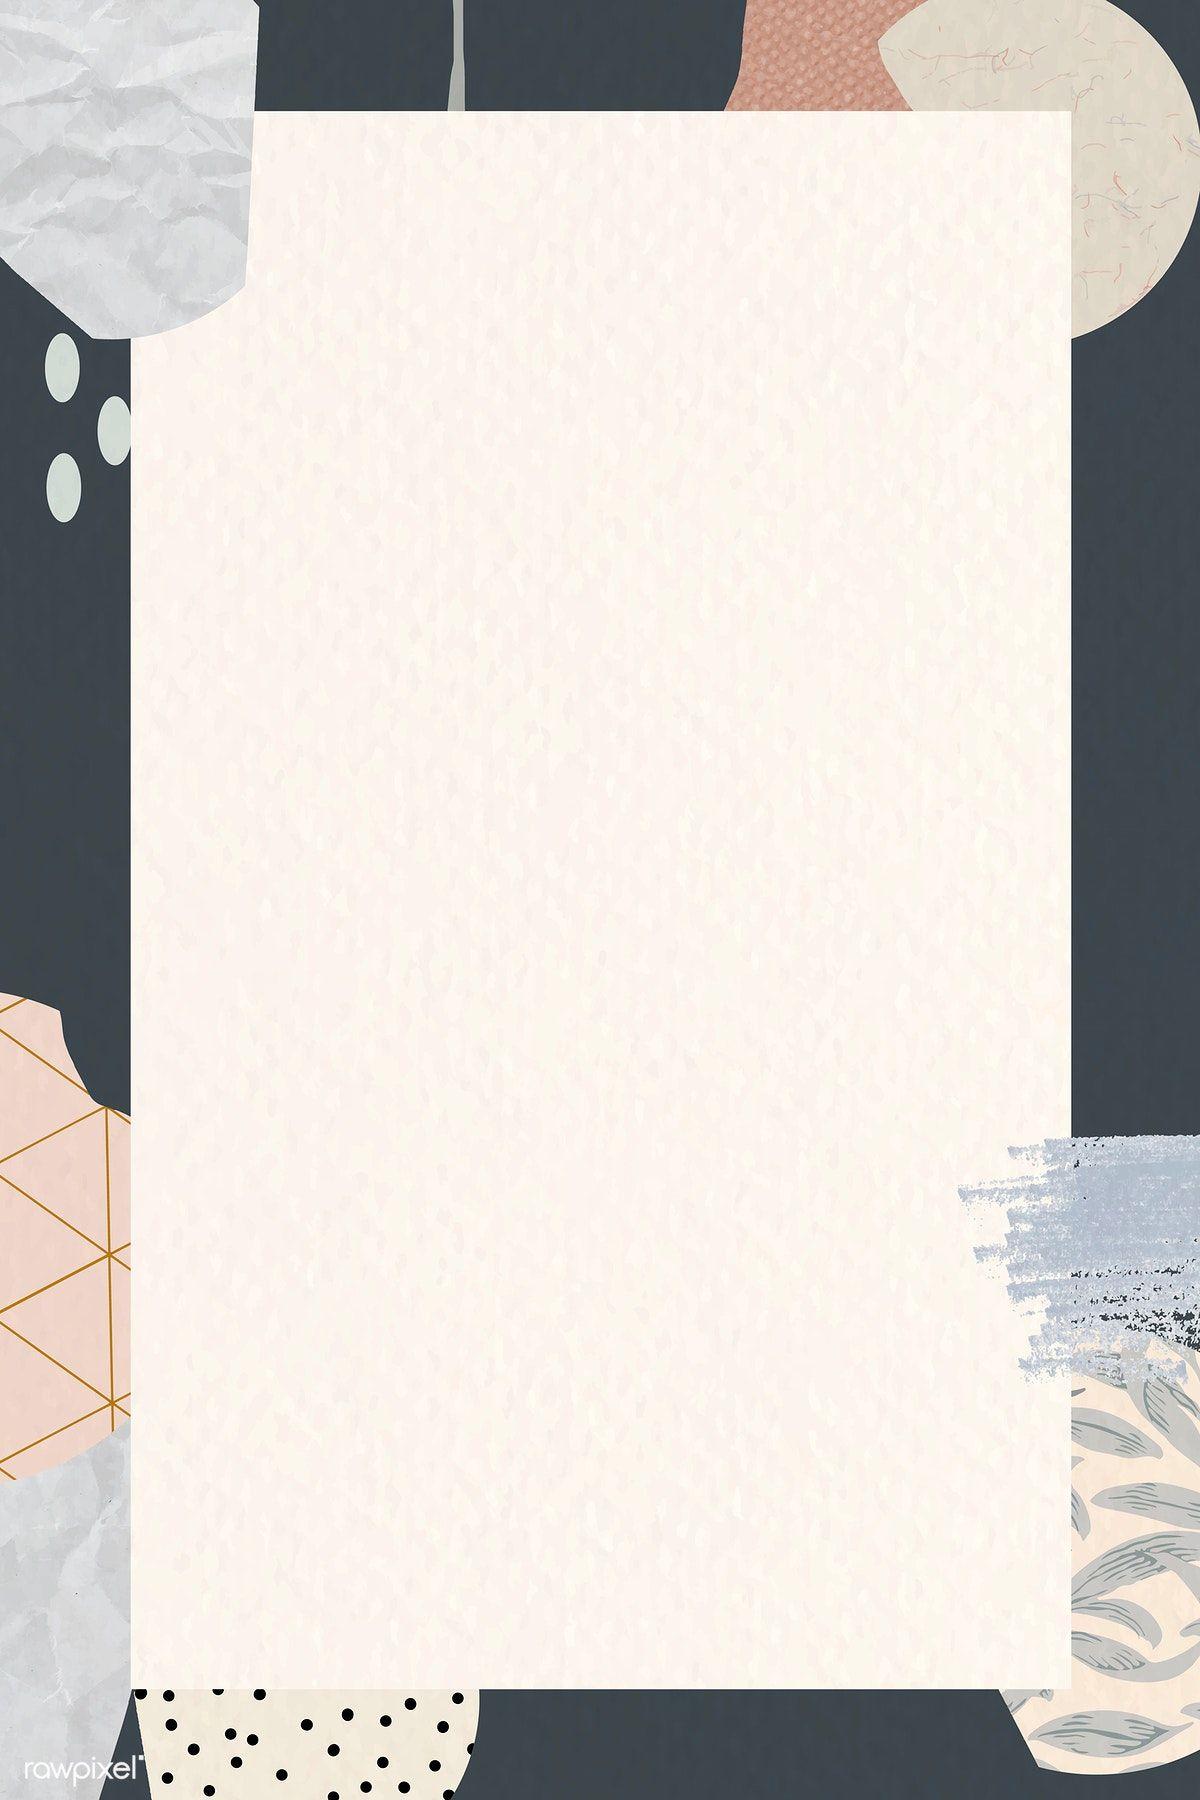 Download Premium Vector Of Terrazzo Frame On Beige Background Vector Powerpoint Background Design Flower Background Wallpaper Abstract Iphone Wallpaper